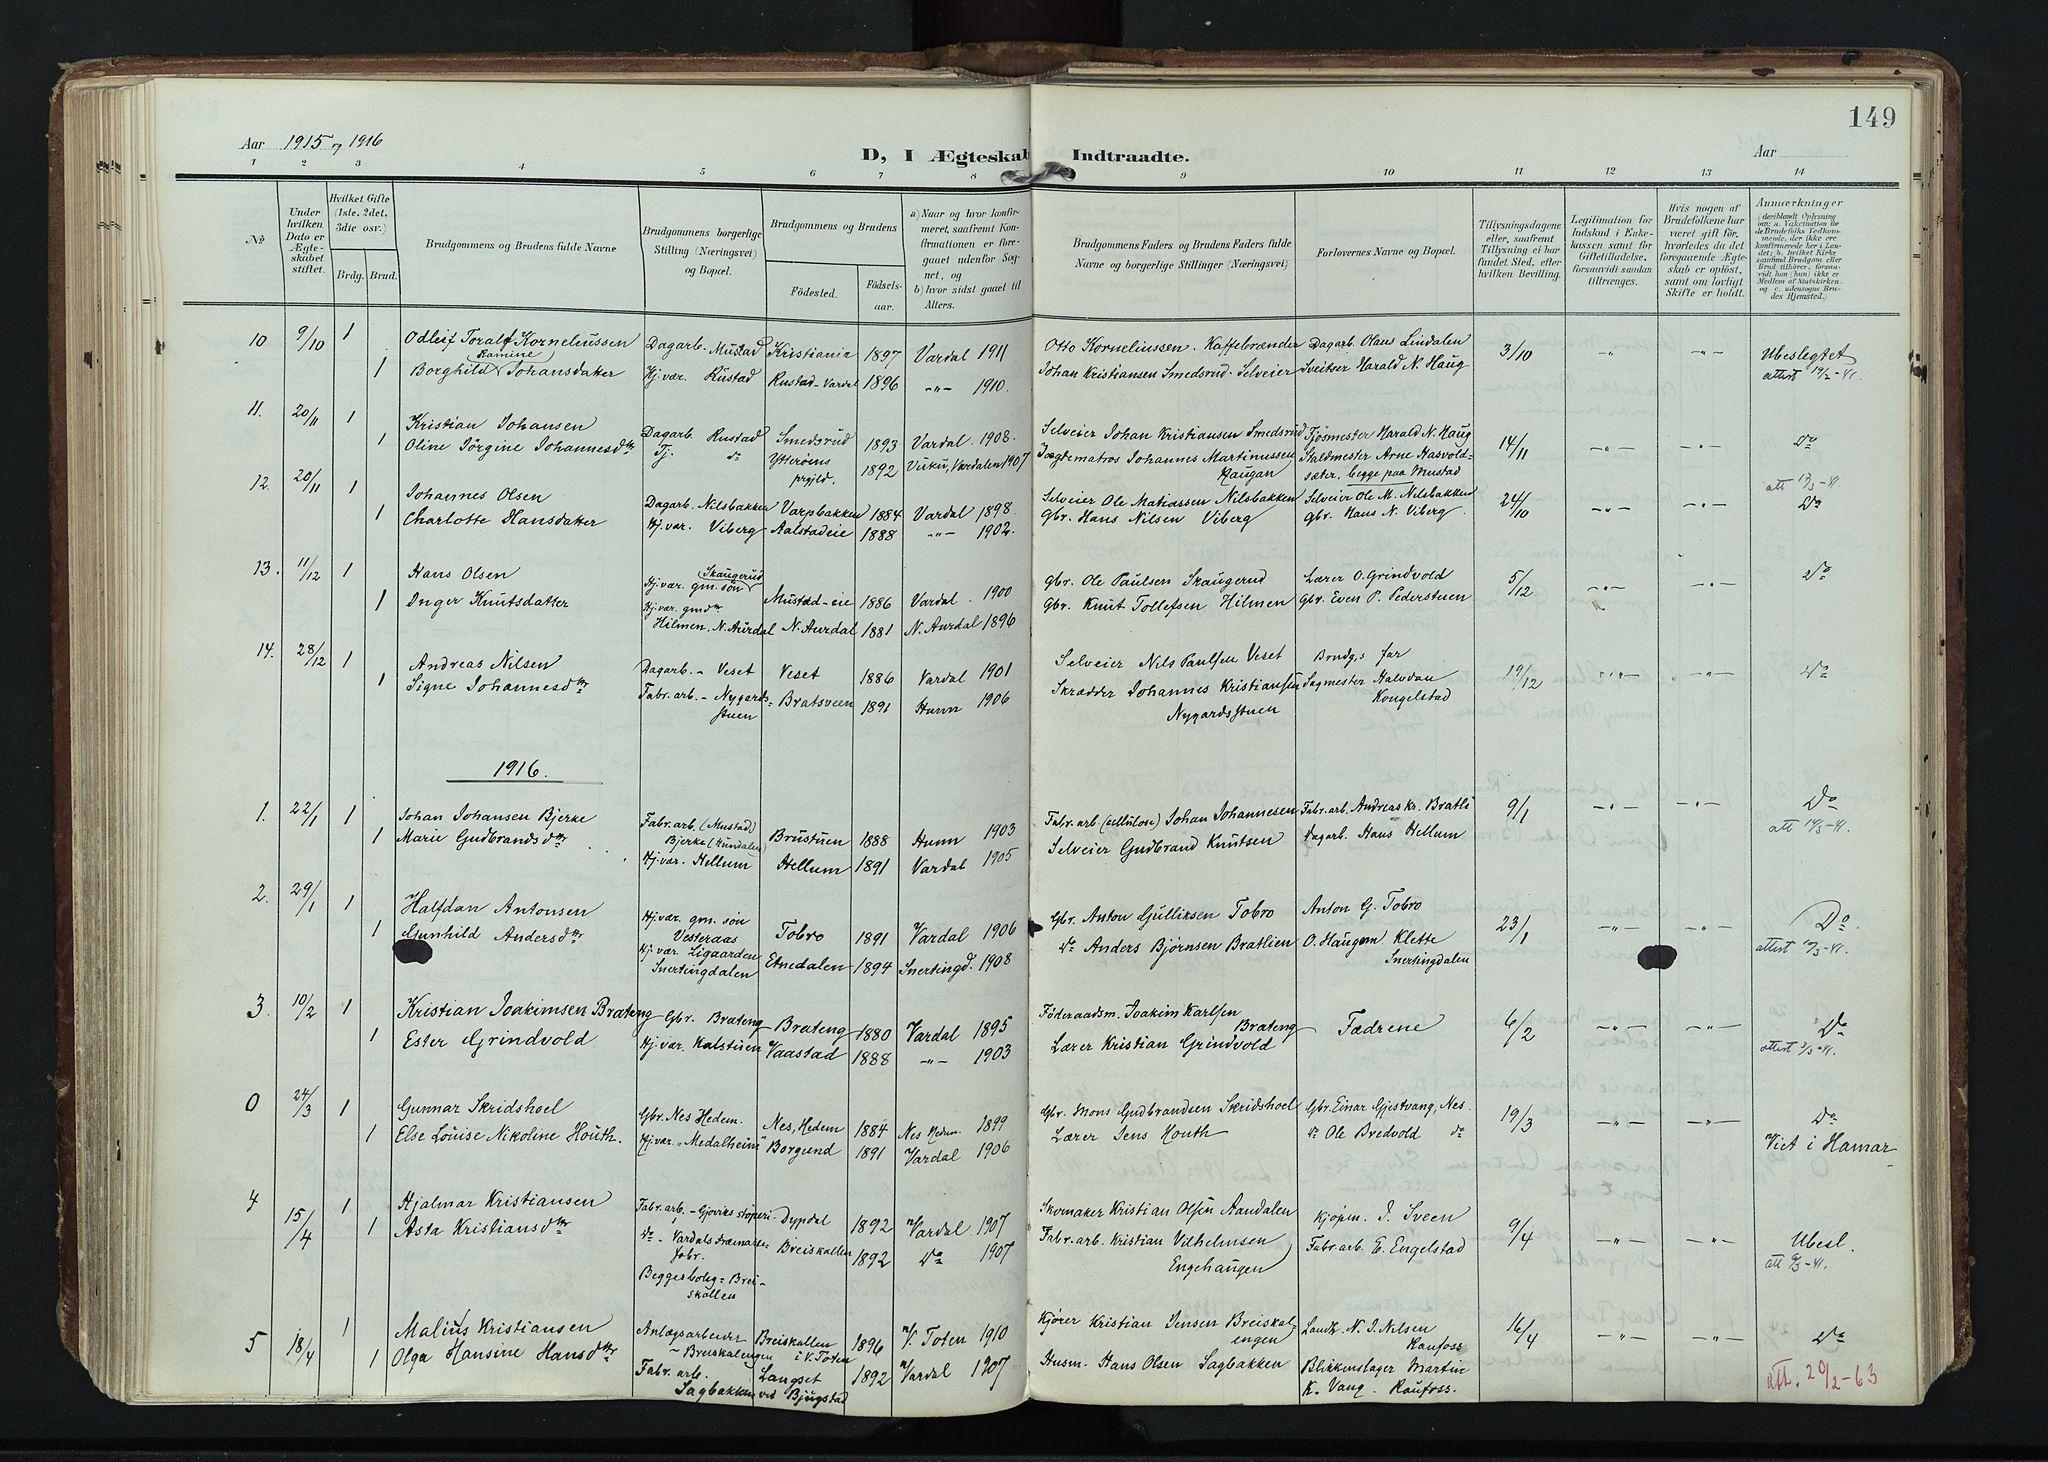 SAH, Vardal prestekontor, H/Ha/Haa/L0020: Ministerialbok nr. 20, 1907-1921, s. 149